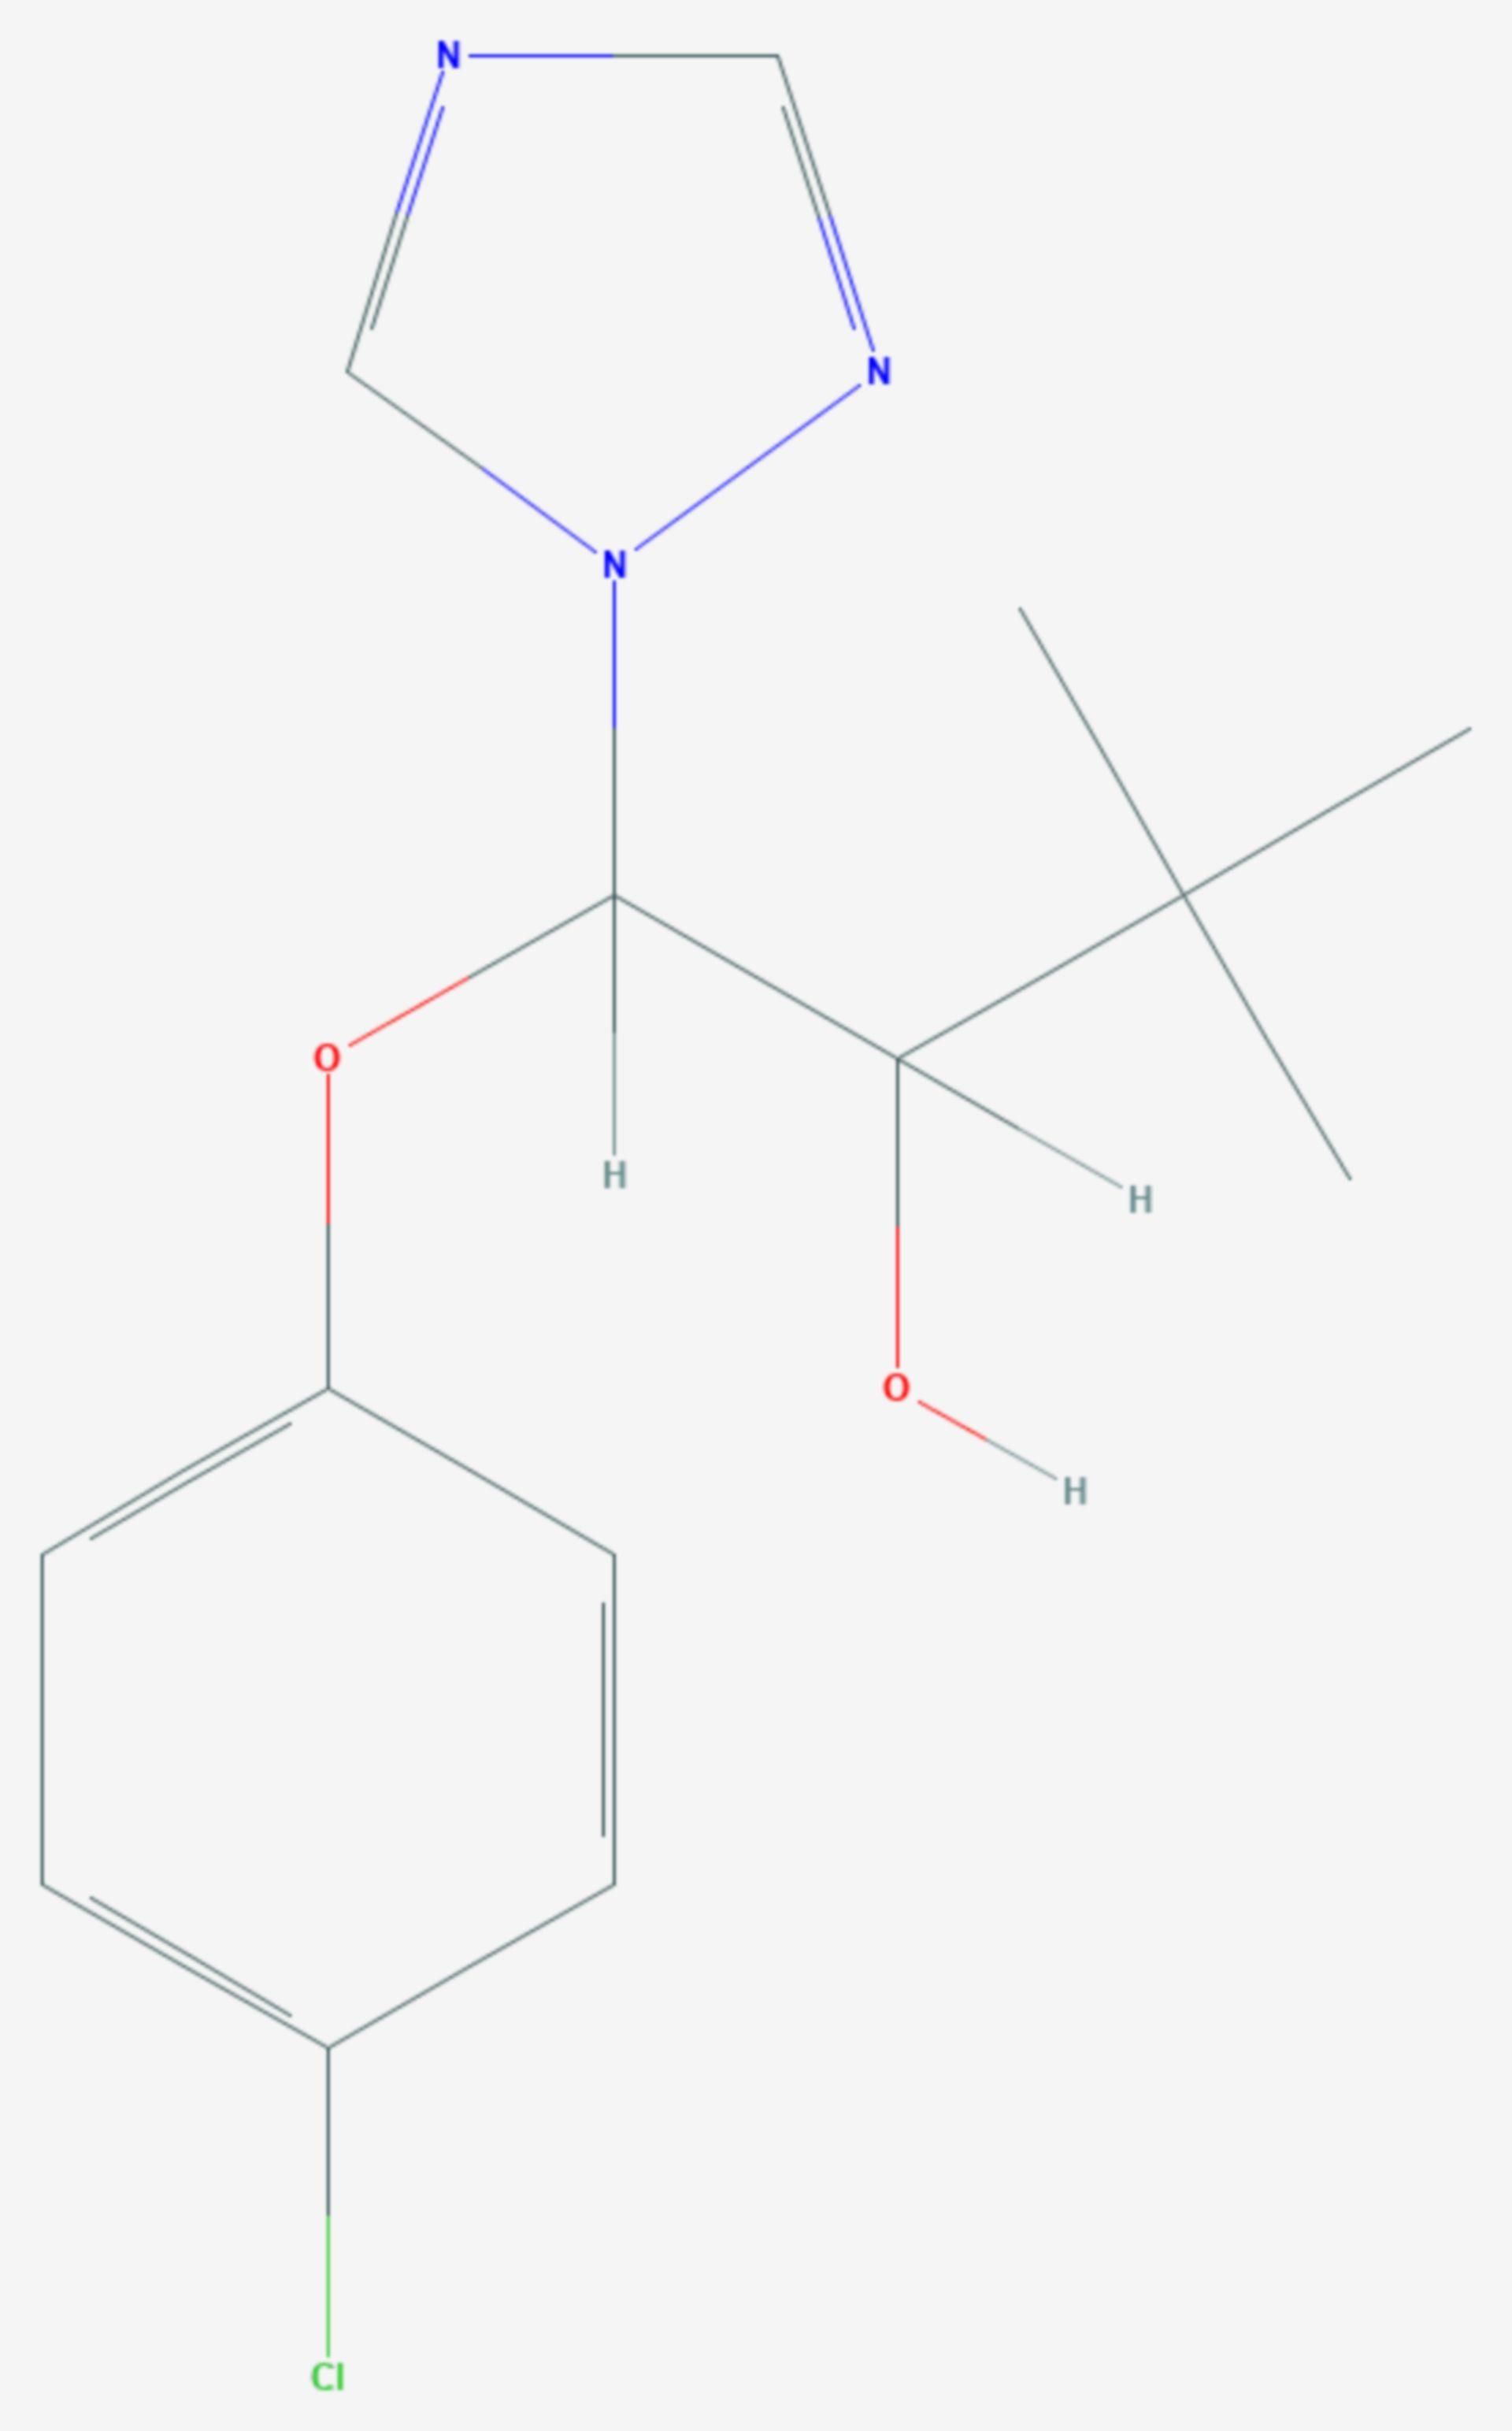 Triadimenol (Strukturformel)